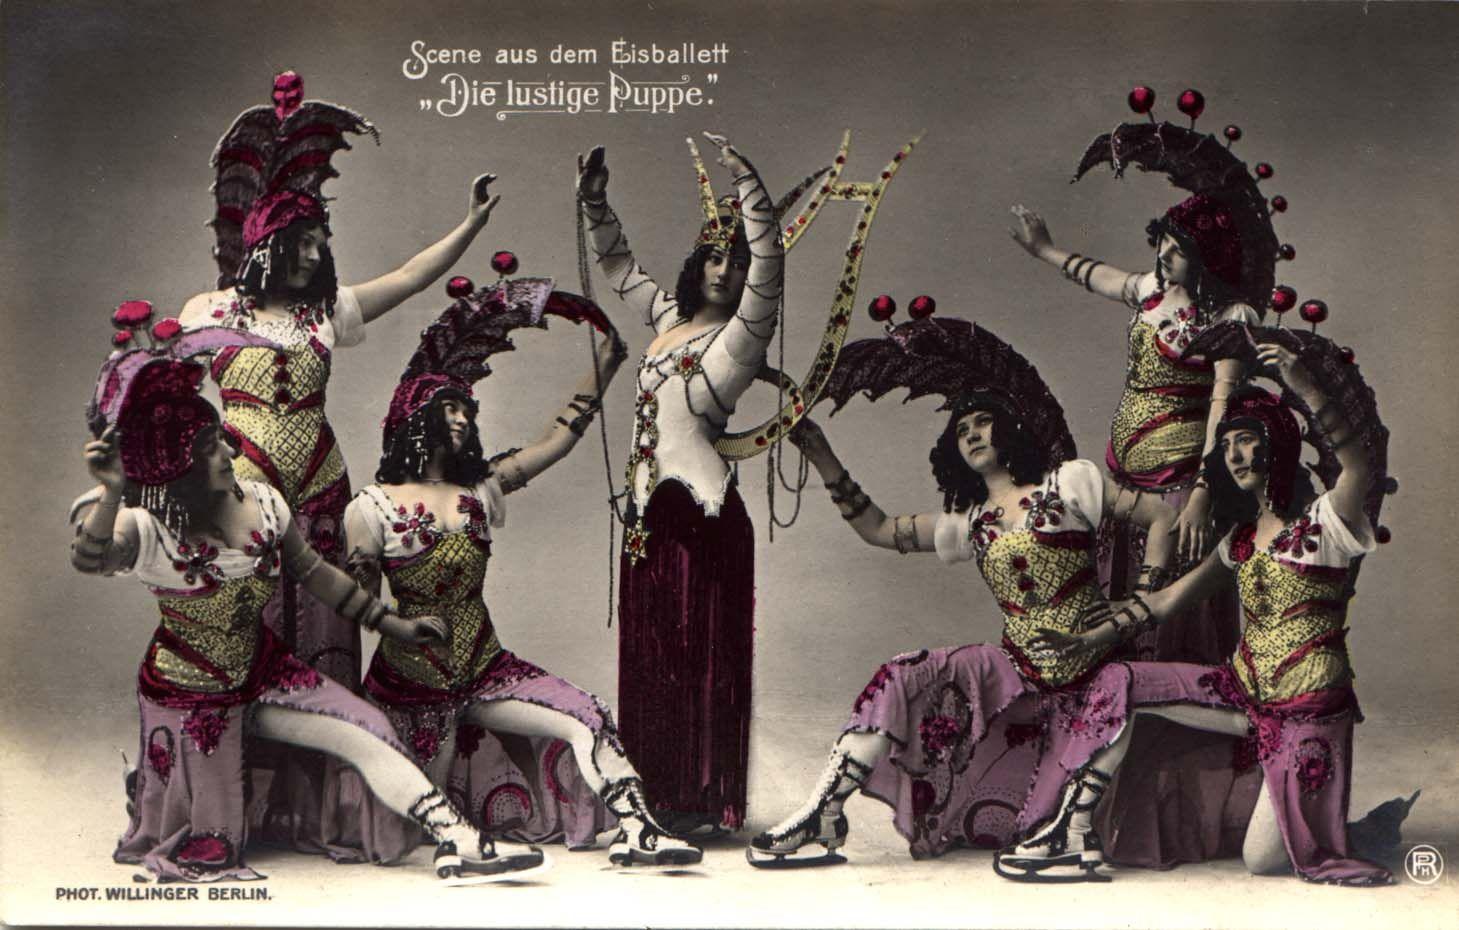 Ice ballett 'The Funny Doll'. 1911